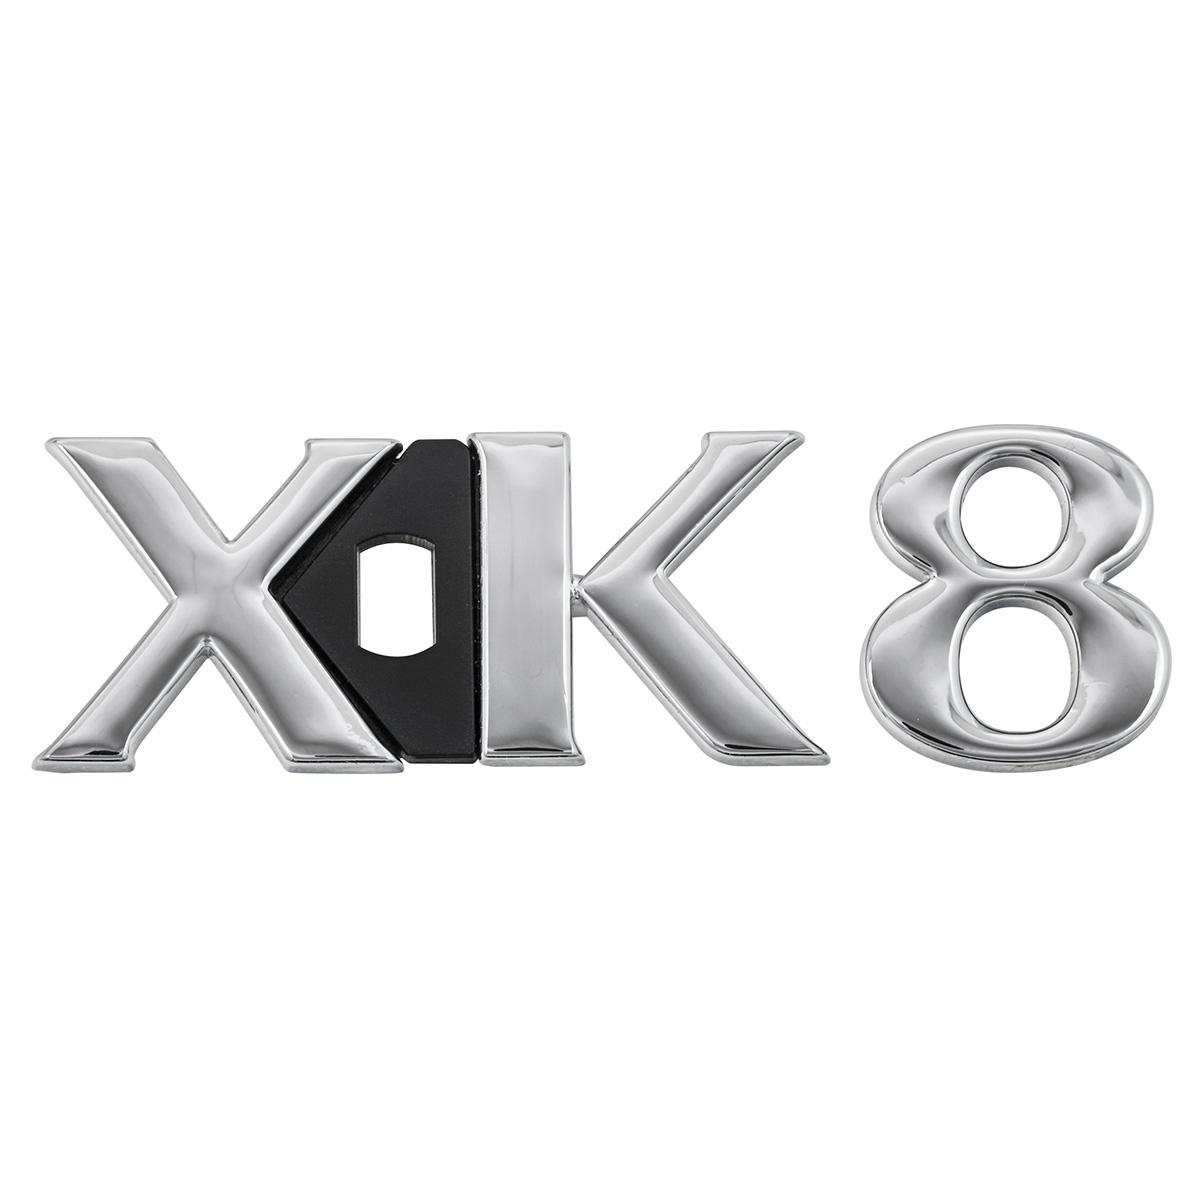 "Jaguar XK8 X100 - Rear badge - RH - Chrome ""XK8"" - Genuine ..."